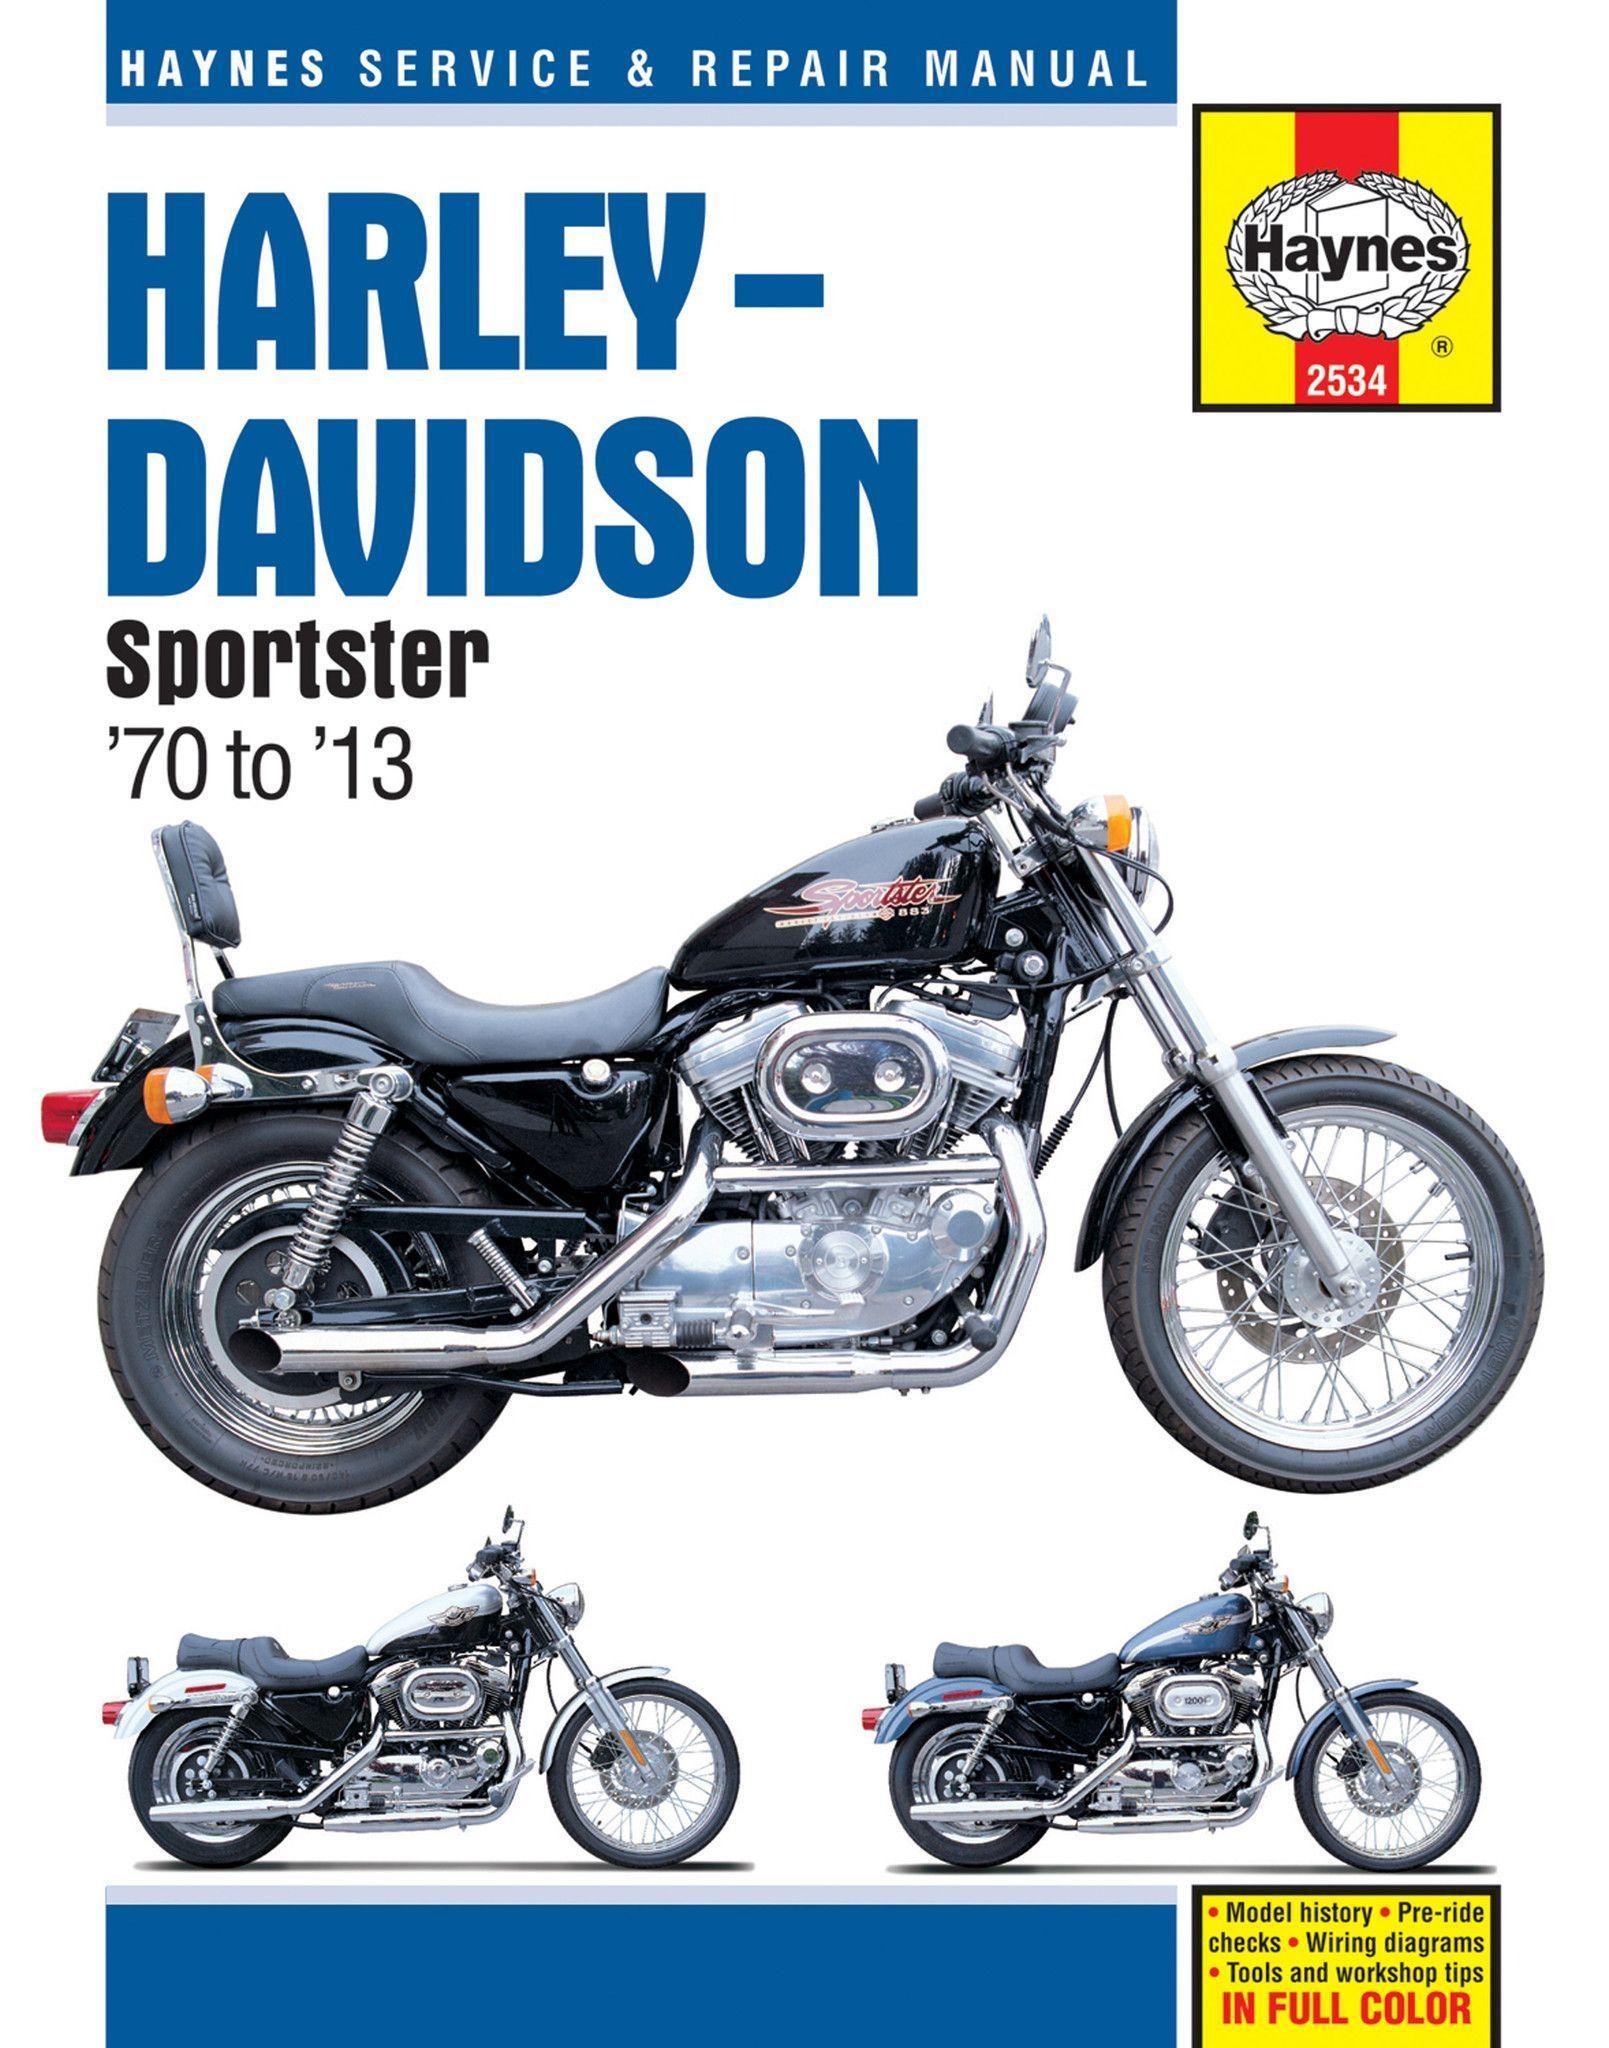 Haynes M2534 Repair Manual For 1970 13 Harley Davidson Sportsters Xl Xlh Xlch Xls Xlx With 883 1000 1100